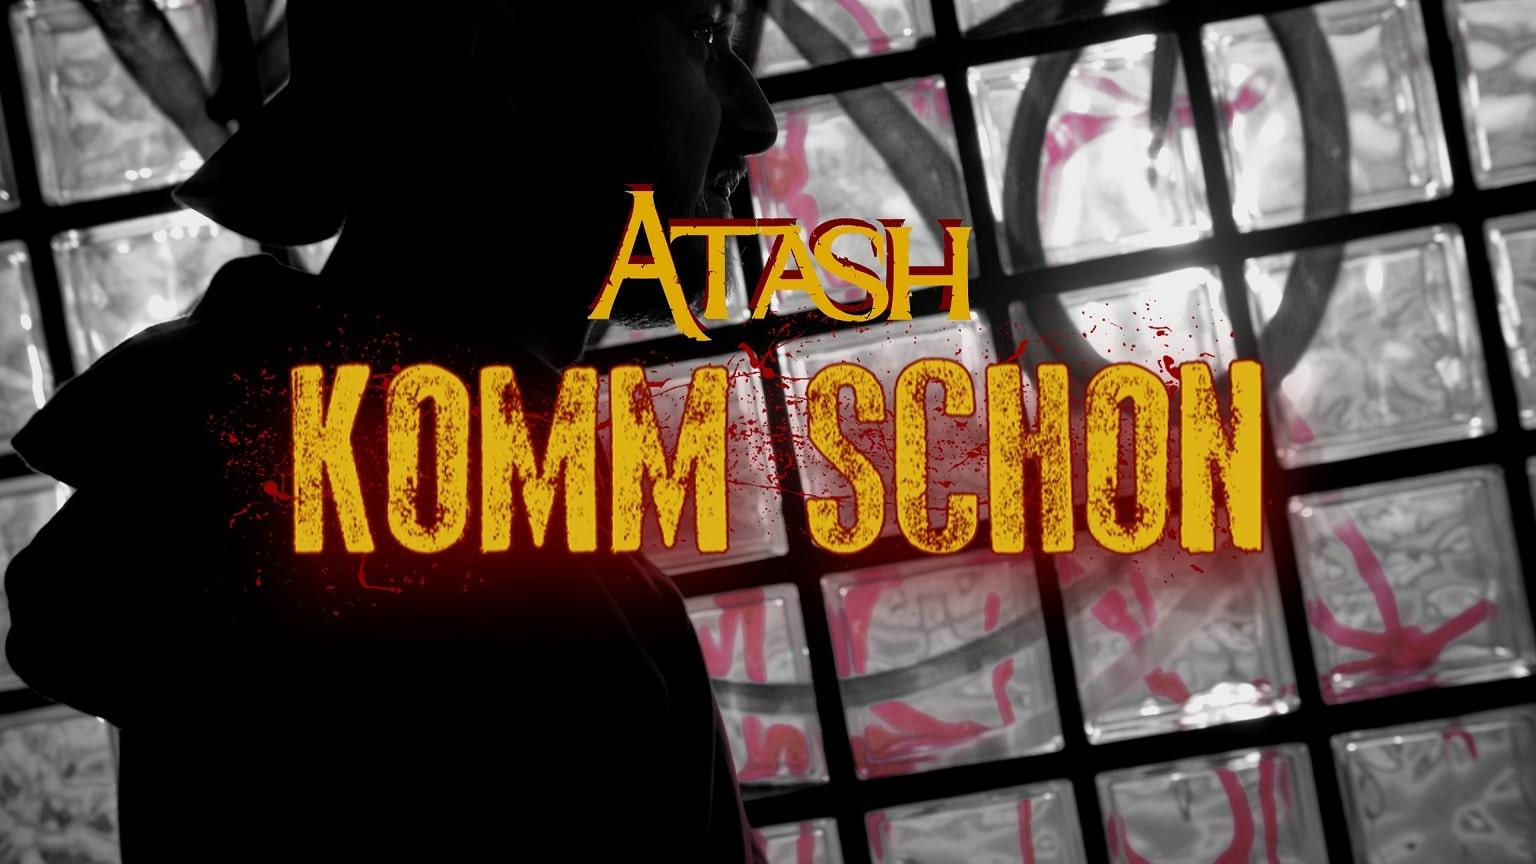 Upcoming: Atash - Komm Schon (prod. JVSON) [Official Video]